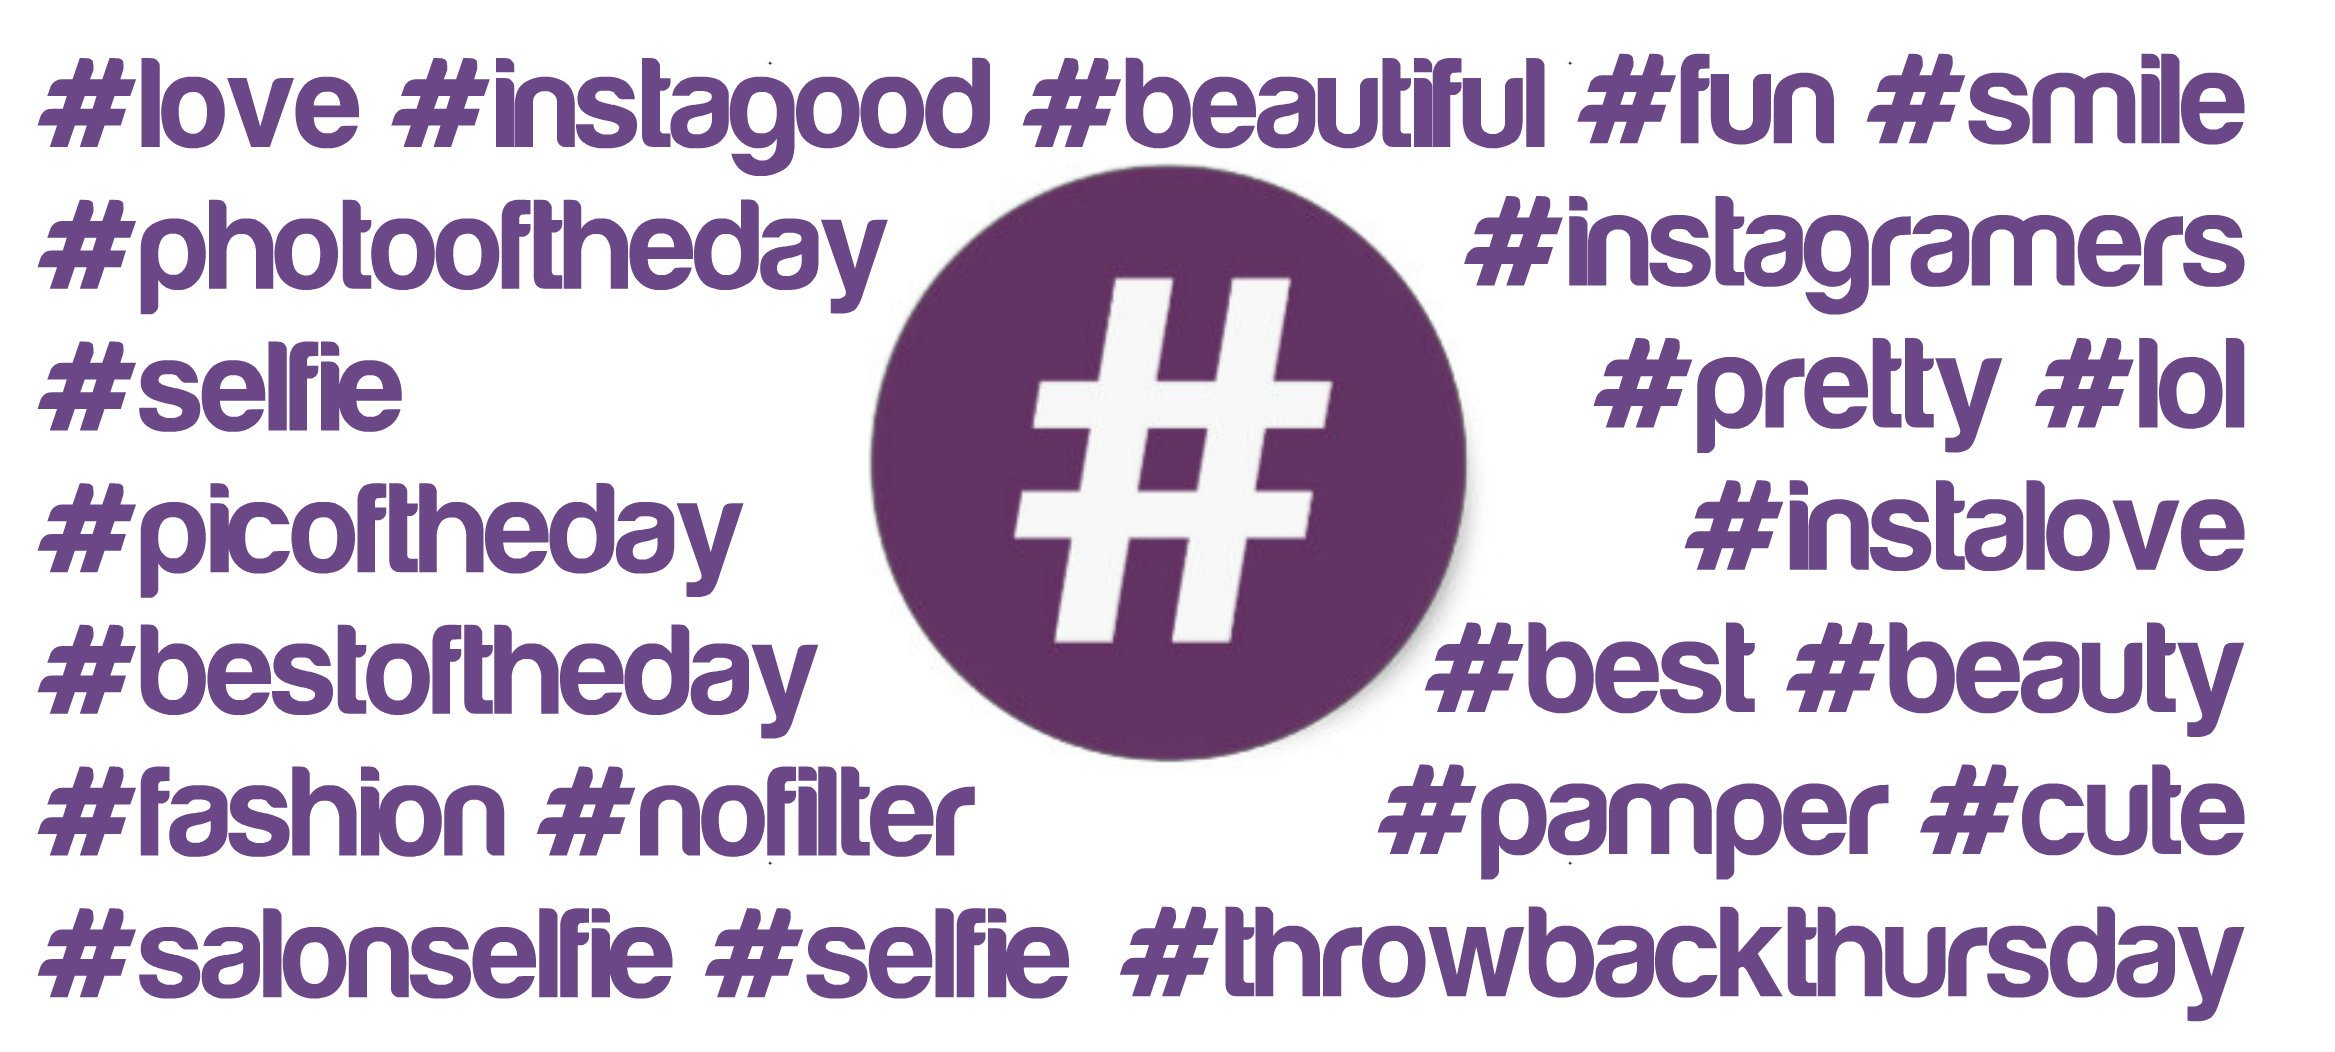 salon-hashtag